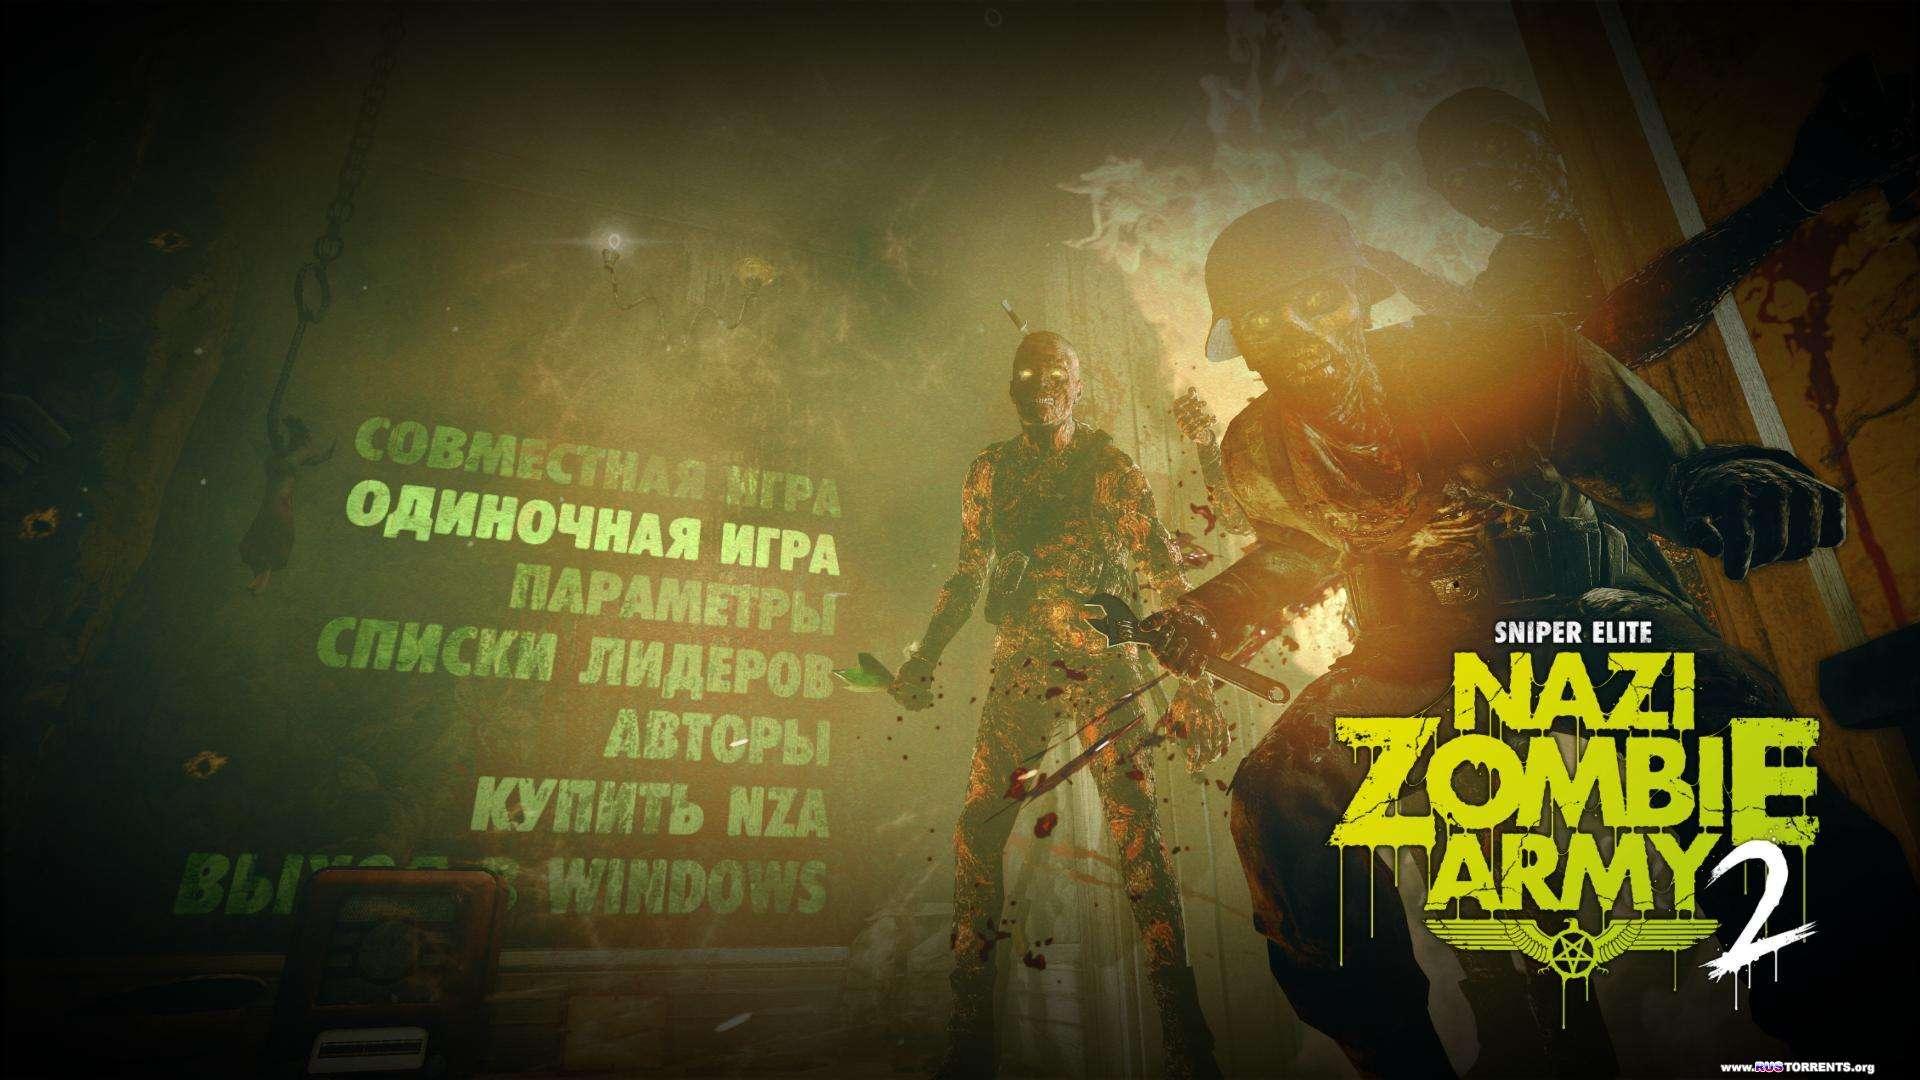 Sniper Elite: Nazi Zombie Army 2 [v 1.2] | PC | Repack от Brick